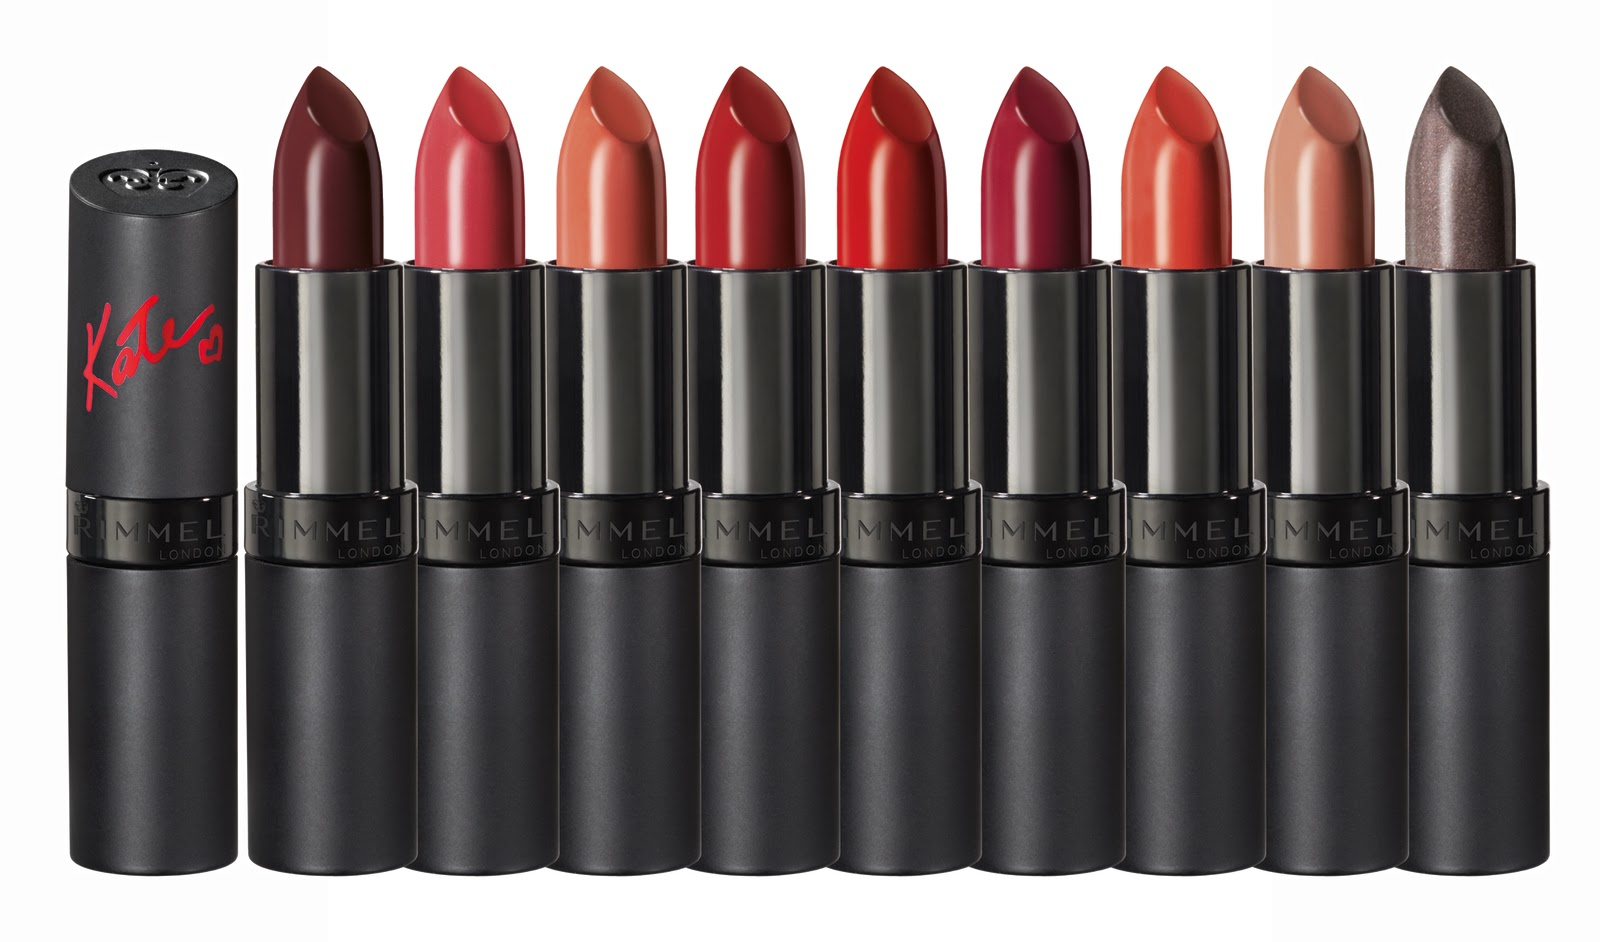 http://1.bp.blogspot.com/-2MKN7qpHe18/UMH00ze1guI/AAAAAAAAAEc/bhq5wLoUDmo/s1600/Kate_Lasting_Finish_Lipstick_range.jpg